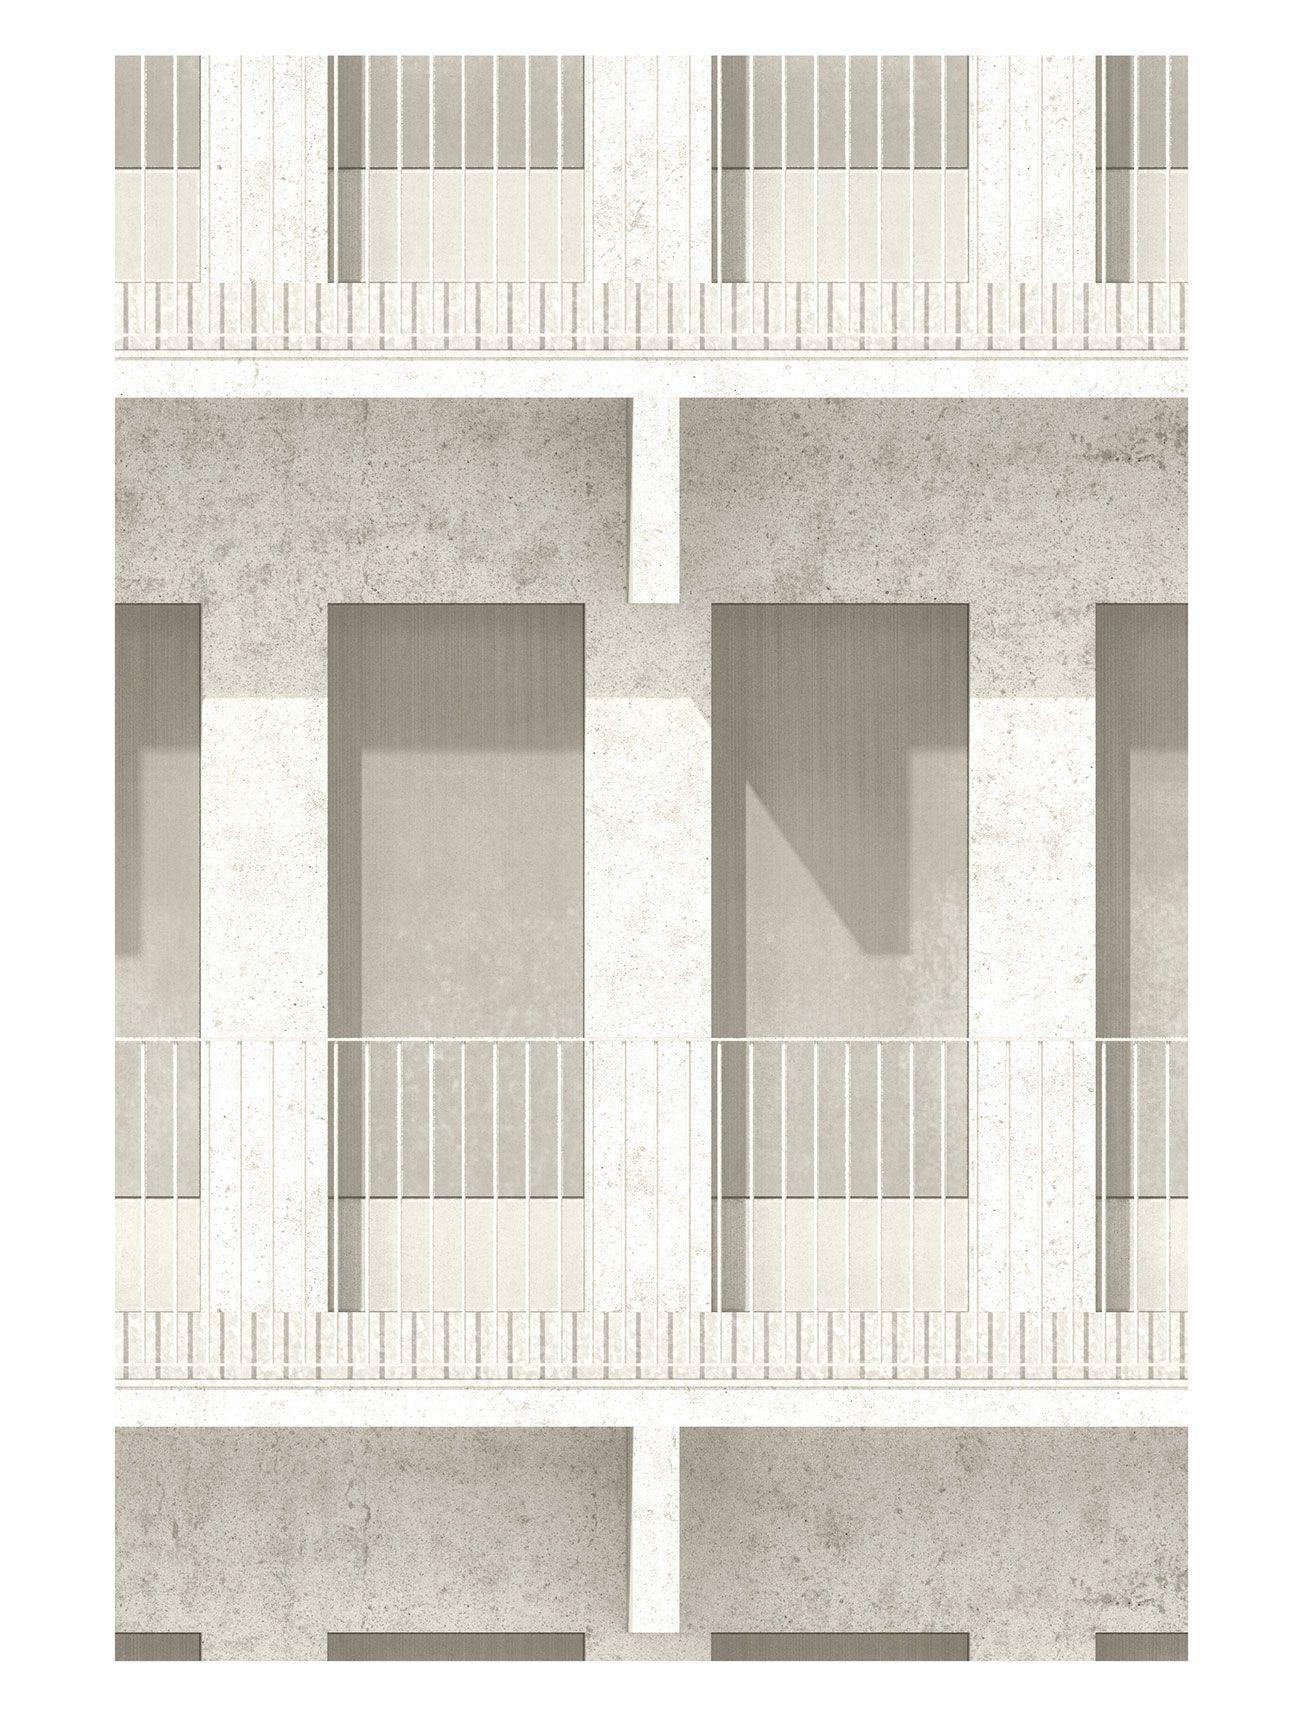 tvk projets architecture represensation pinterest. Black Bedroom Furniture Sets. Home Design Ideas